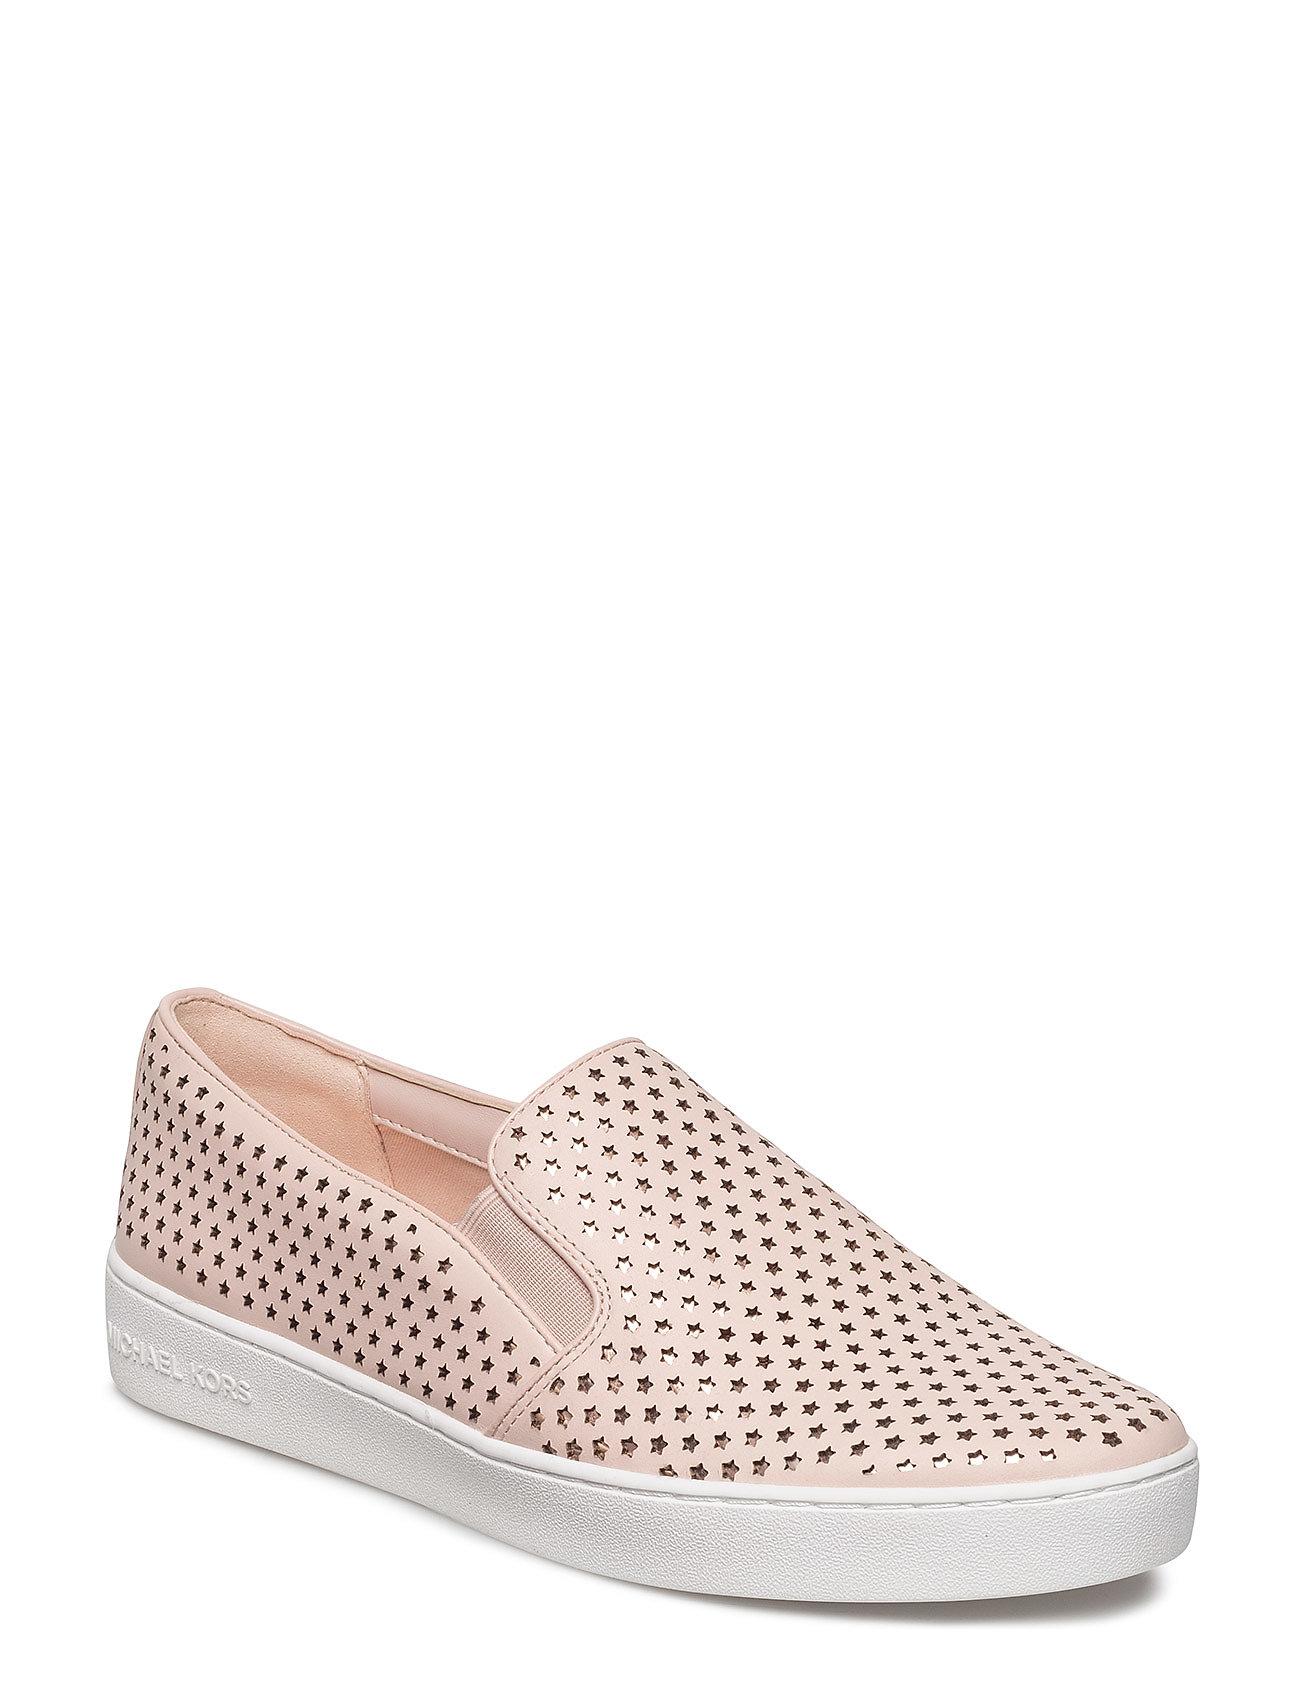 00e40a2a013d Michael Kors Shoes Keaton Slip On (Soft Pink)